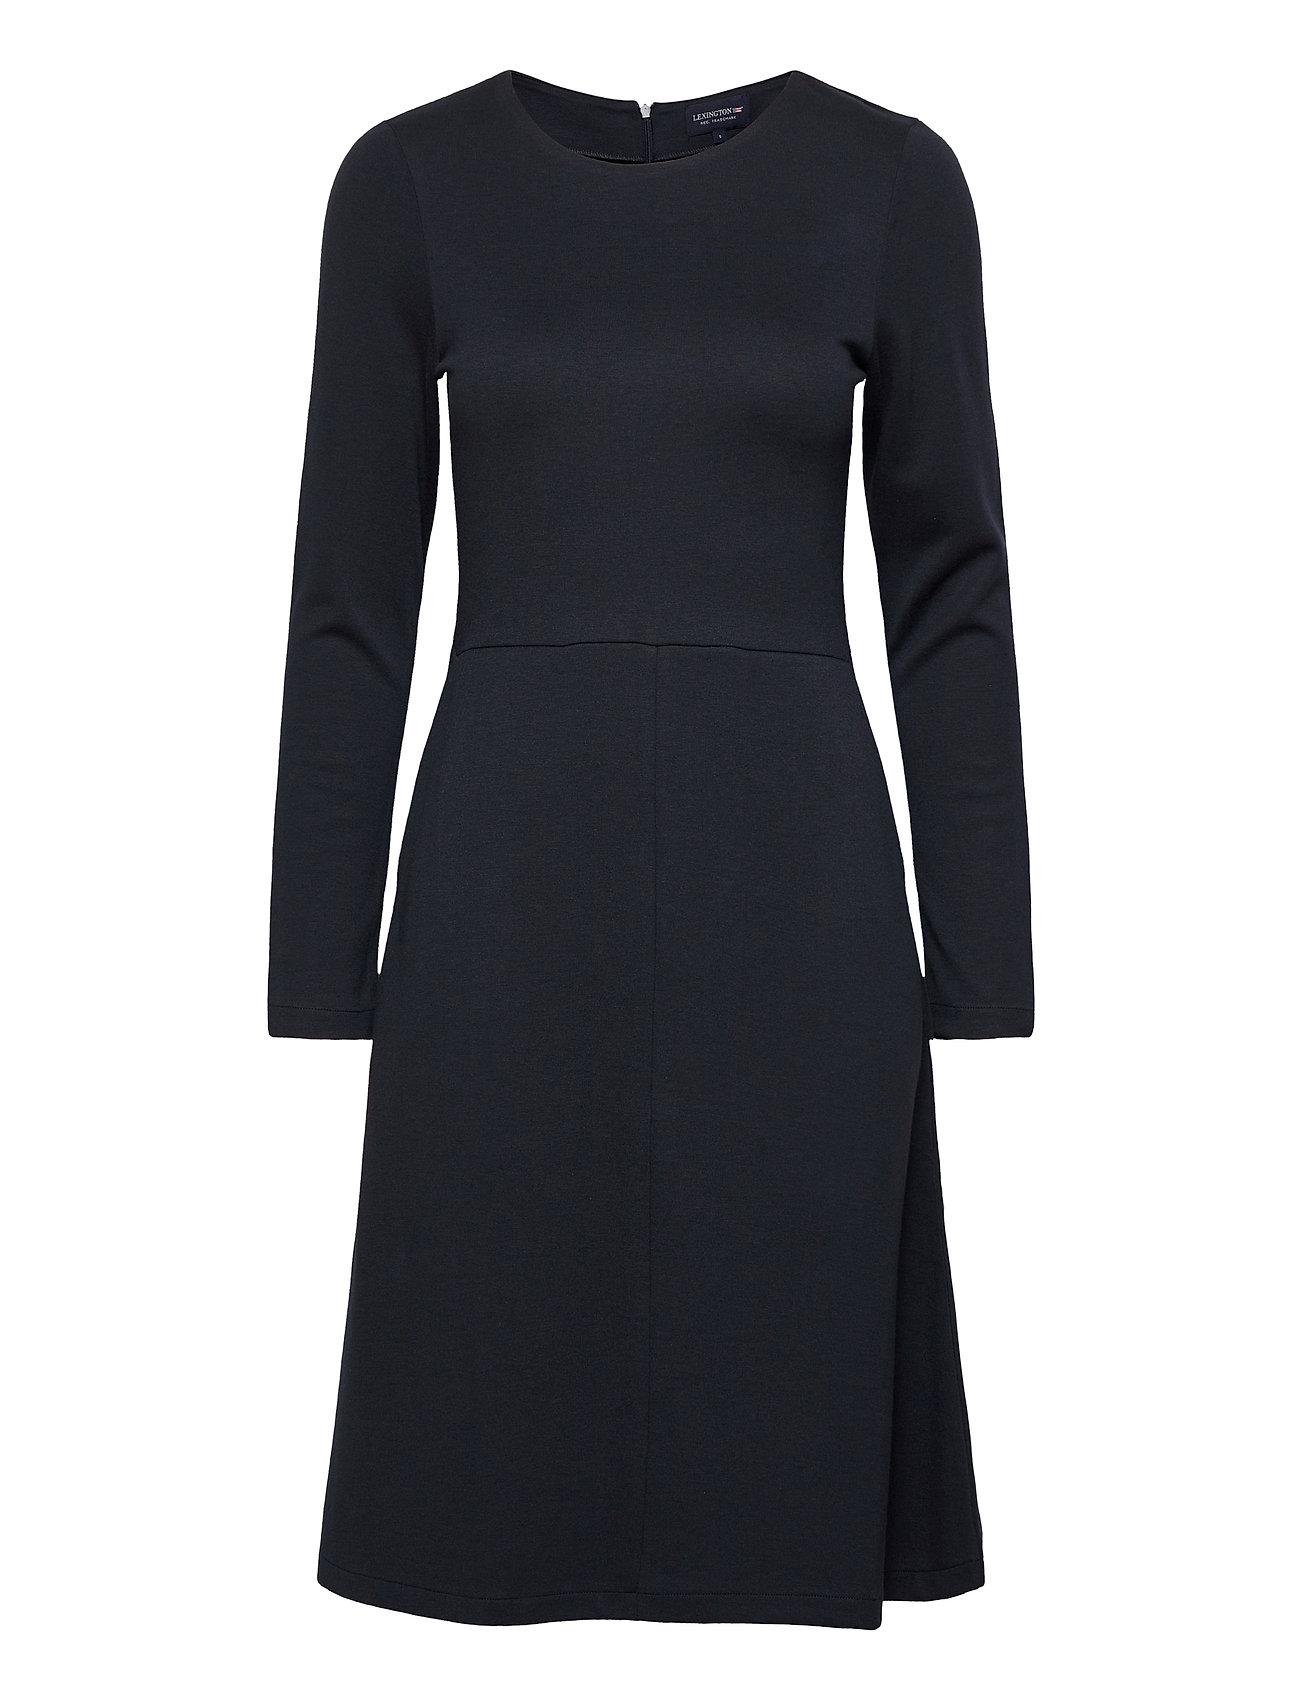 Image of Joan Jersey Dress Knælang Kjole Sort Lexington Clothing (3455222851)